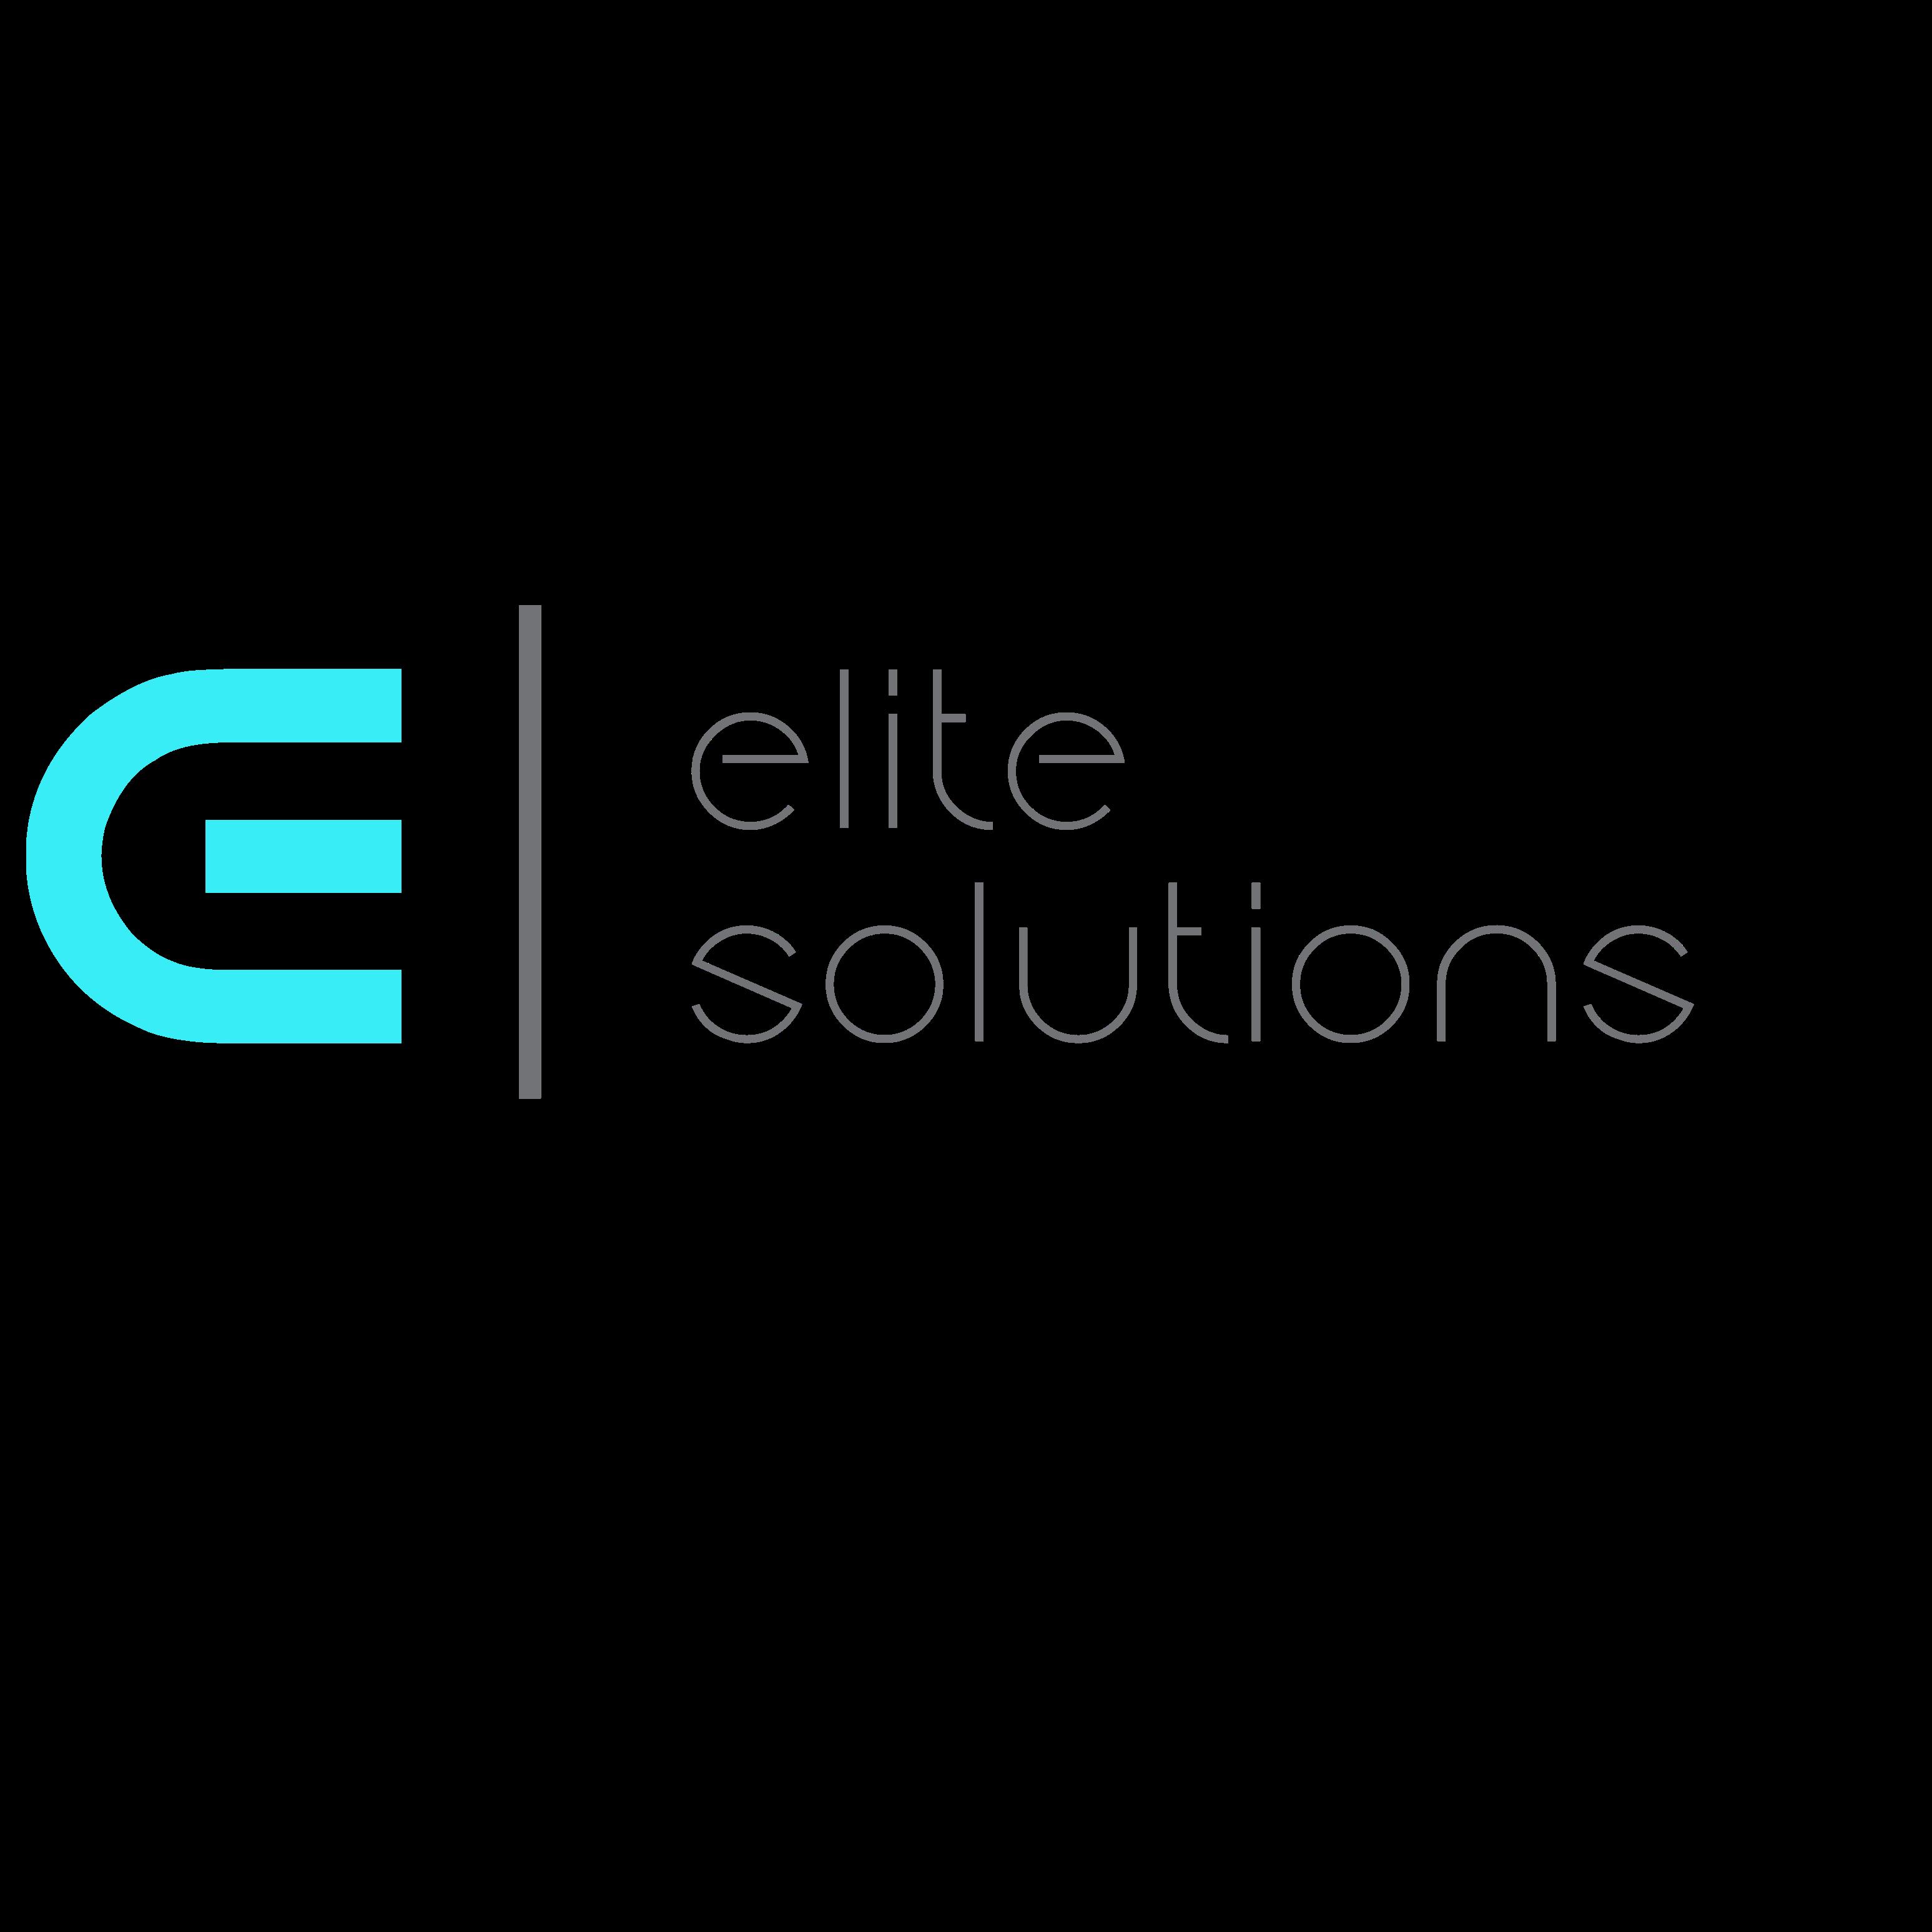 Elite Solutions - Clinton, UT 84015 - (801)742-8581 | ShowMeLocal.com